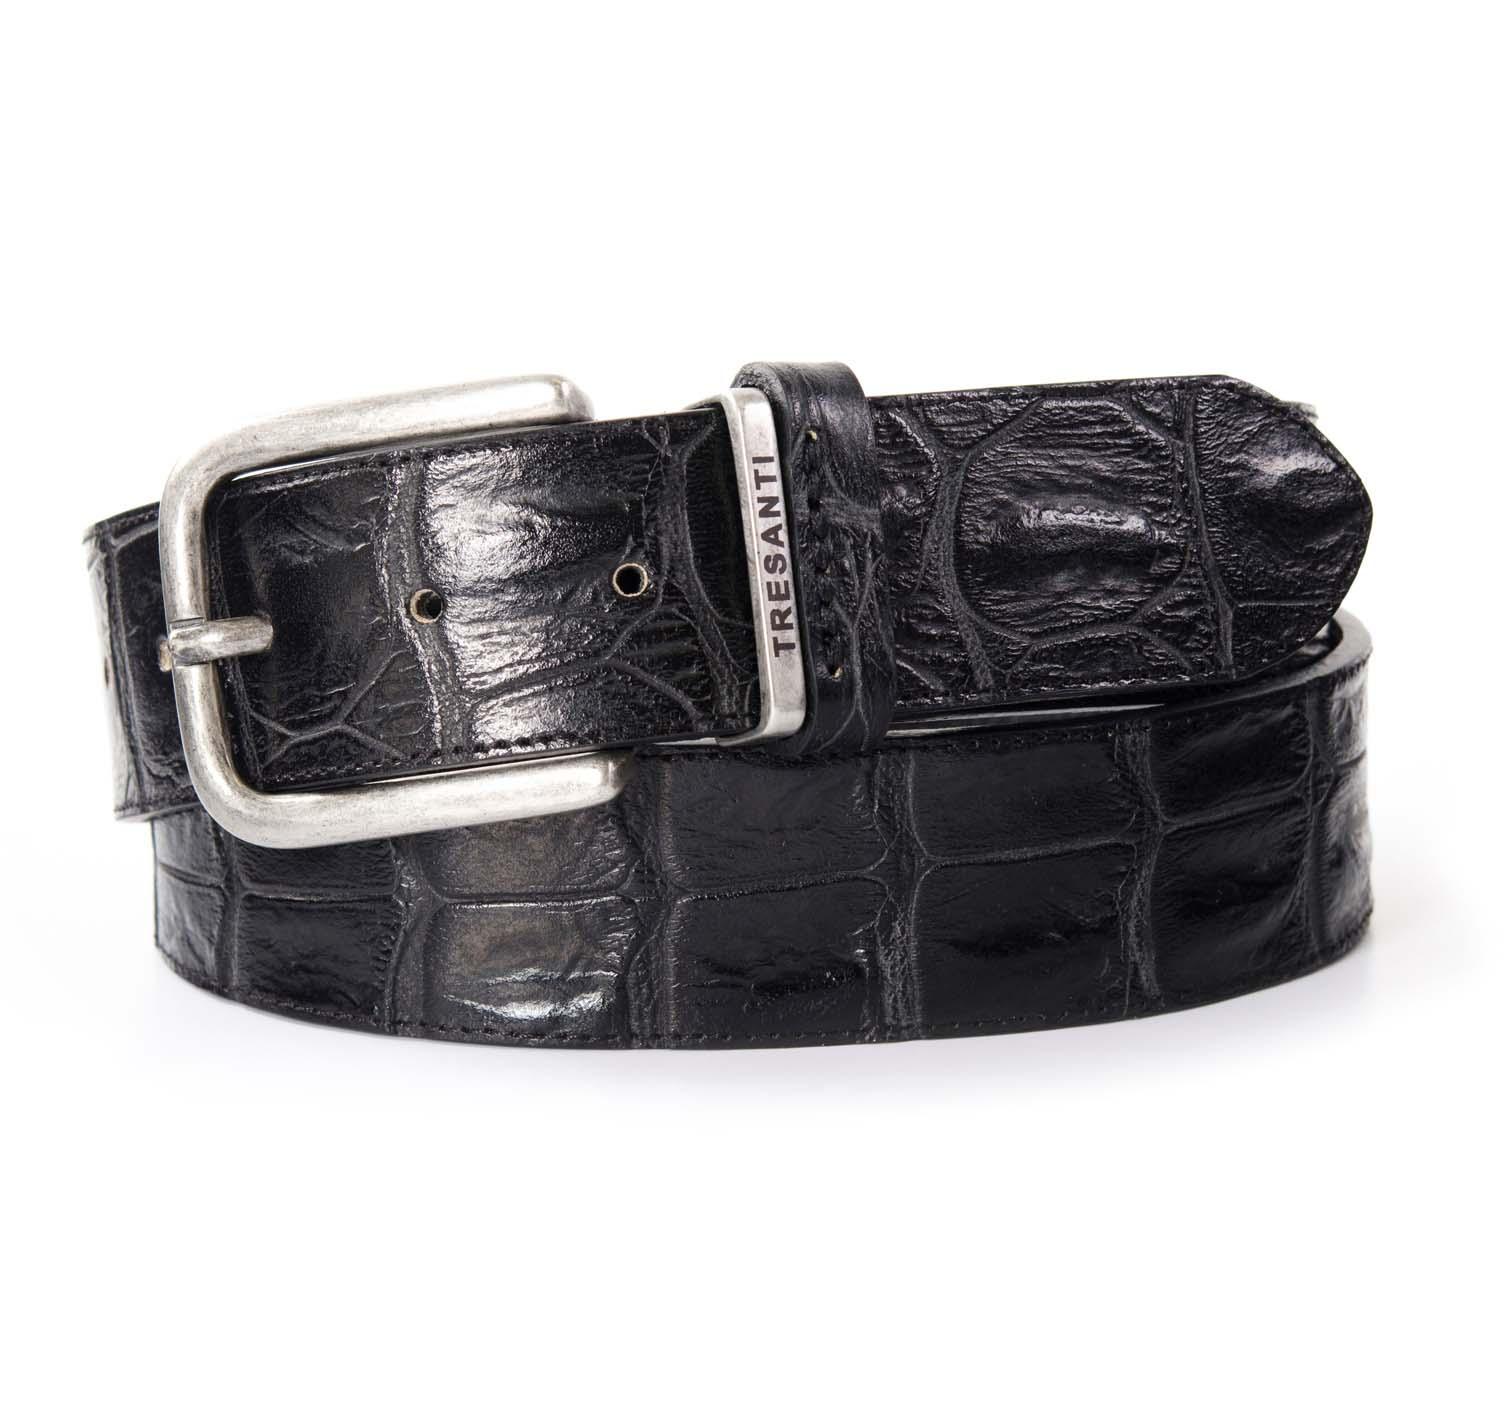 Belt black leather with crocodile print